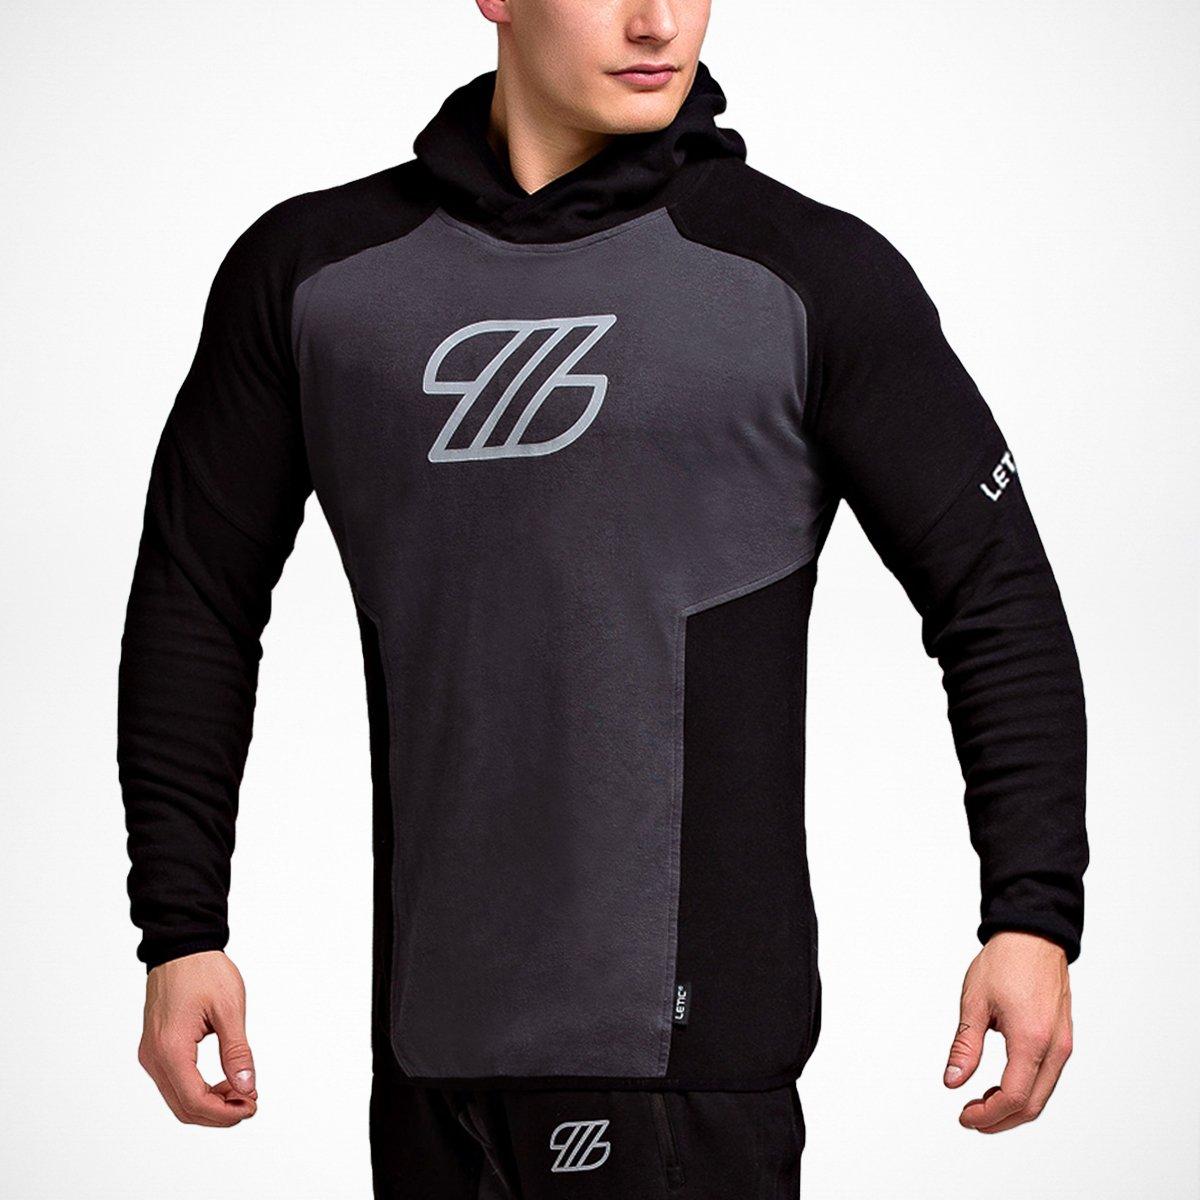 LETIC Gym Herren Fitness Body FIT High Performance Hoodie Sweatshirt mit Kapuze Mesh Schwarz-Dunkelgrau